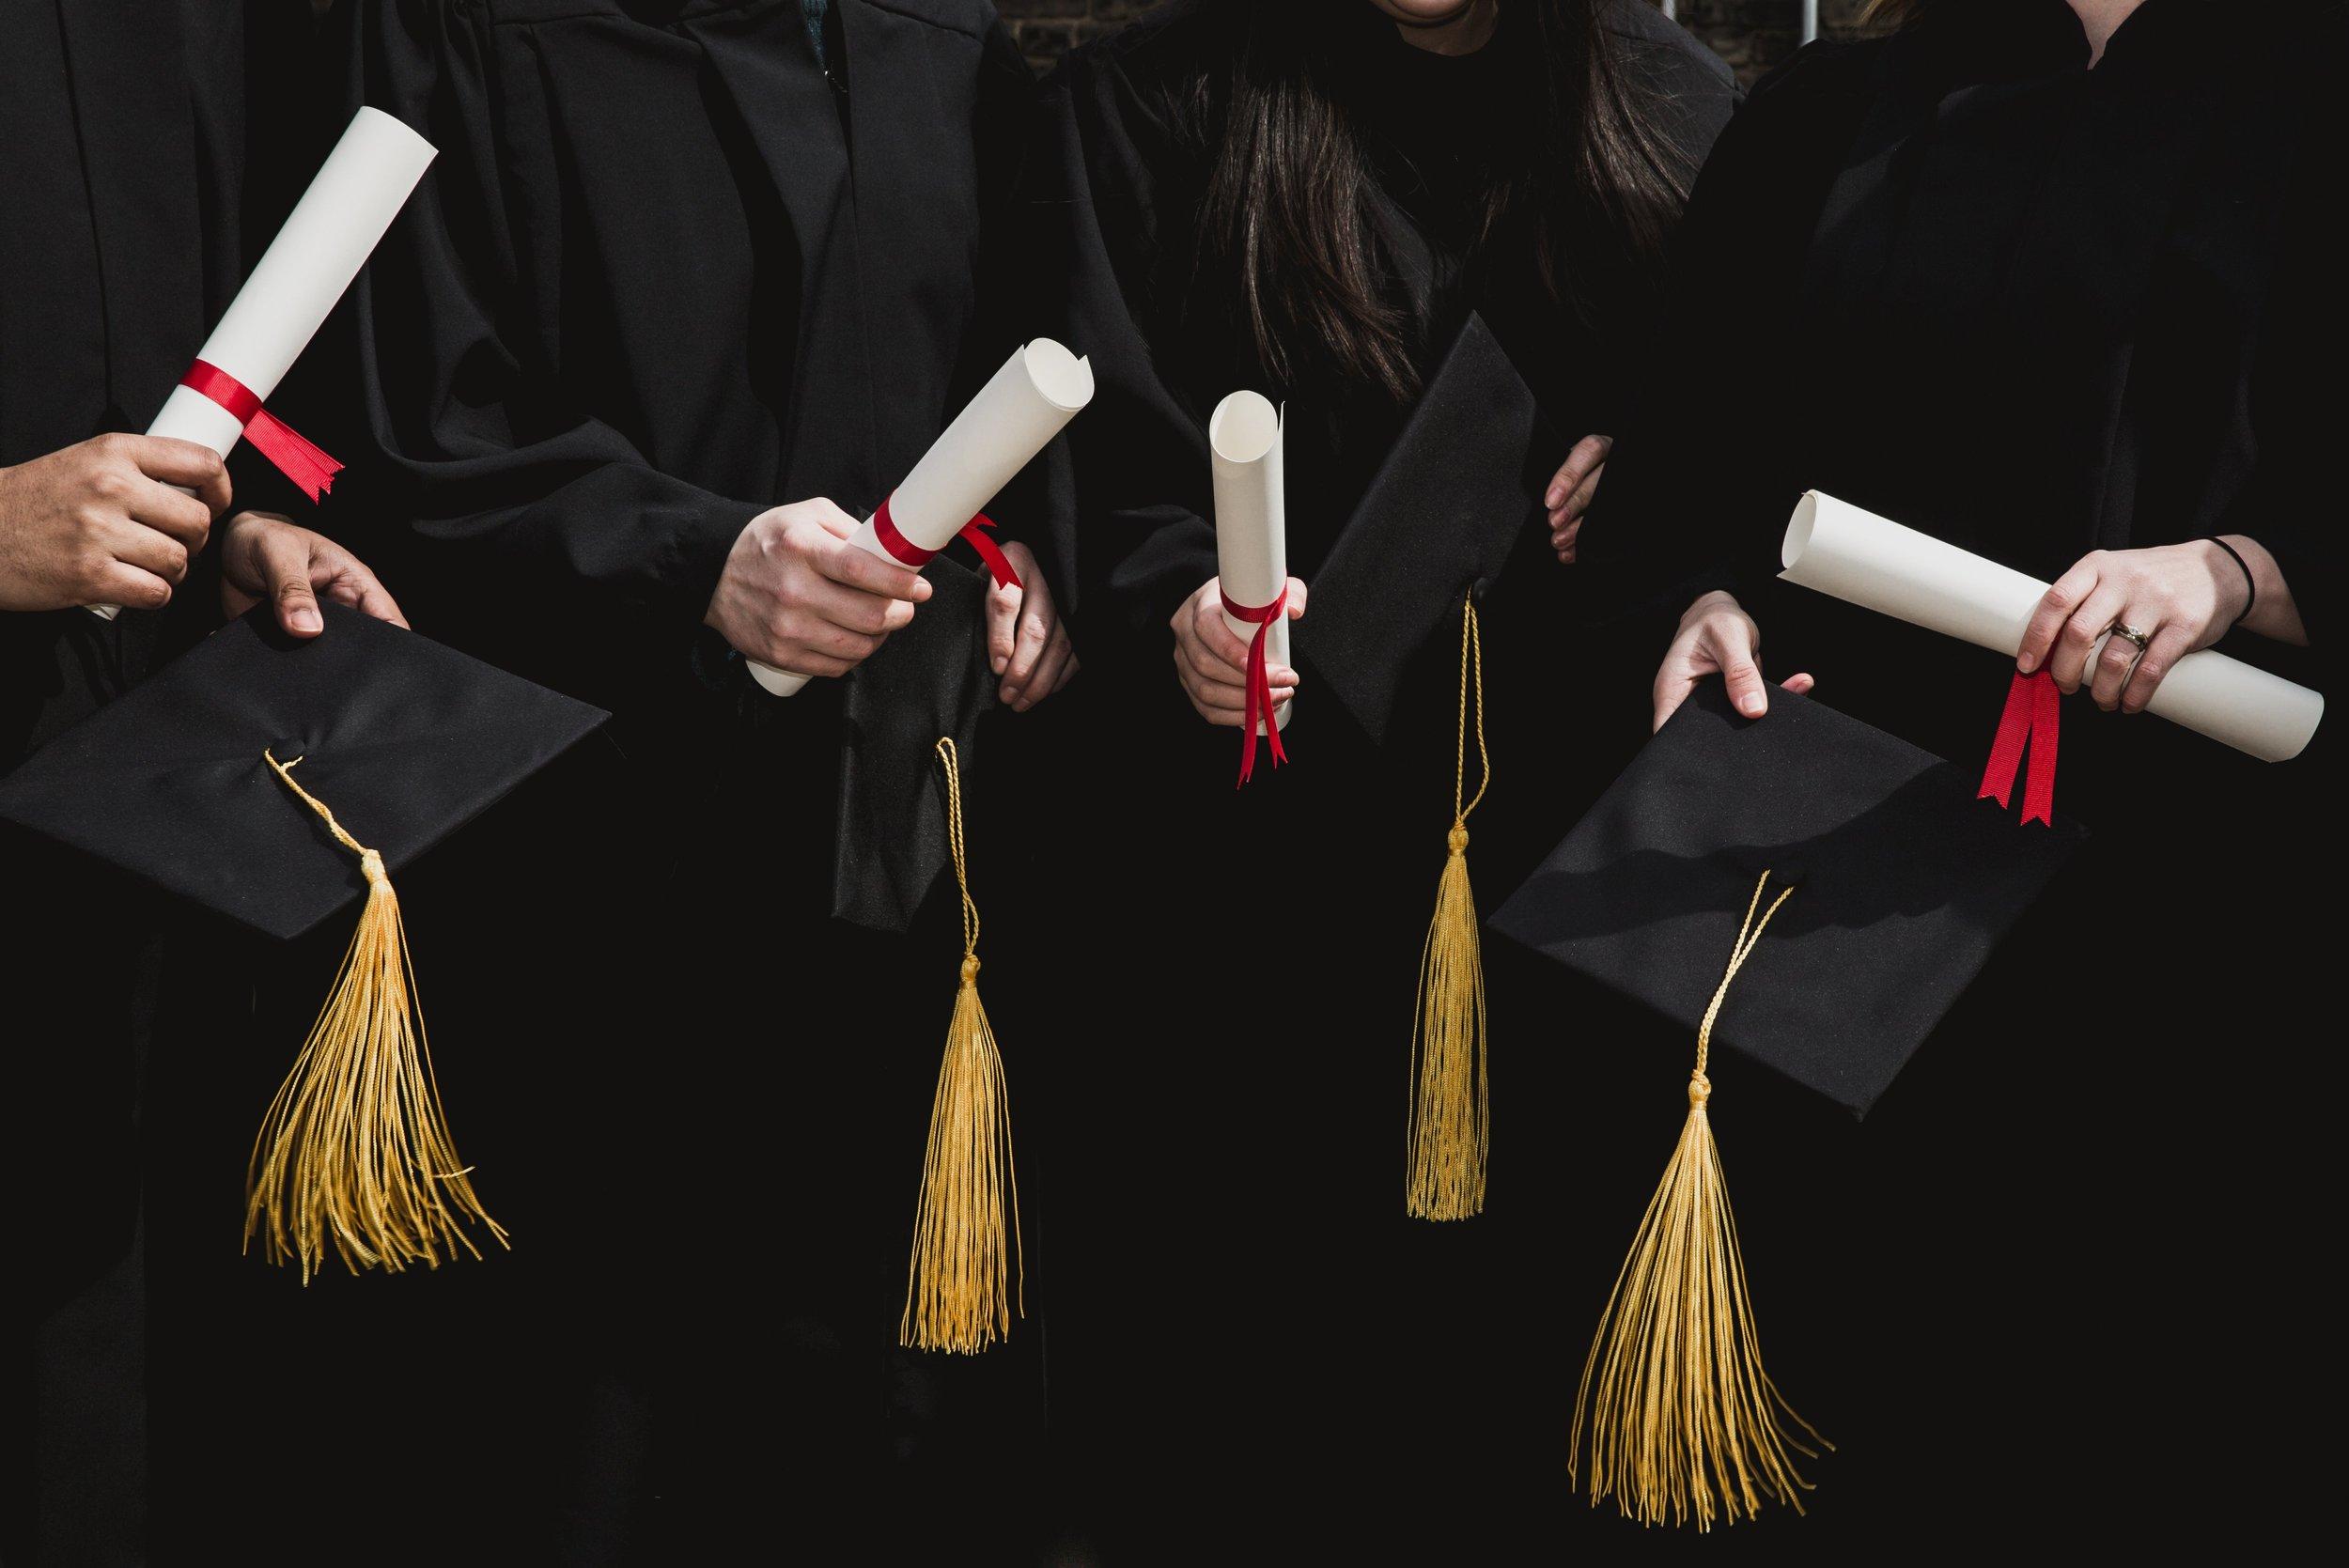 four-grad-students-caps-and-diplomas_4460x4460.jpg